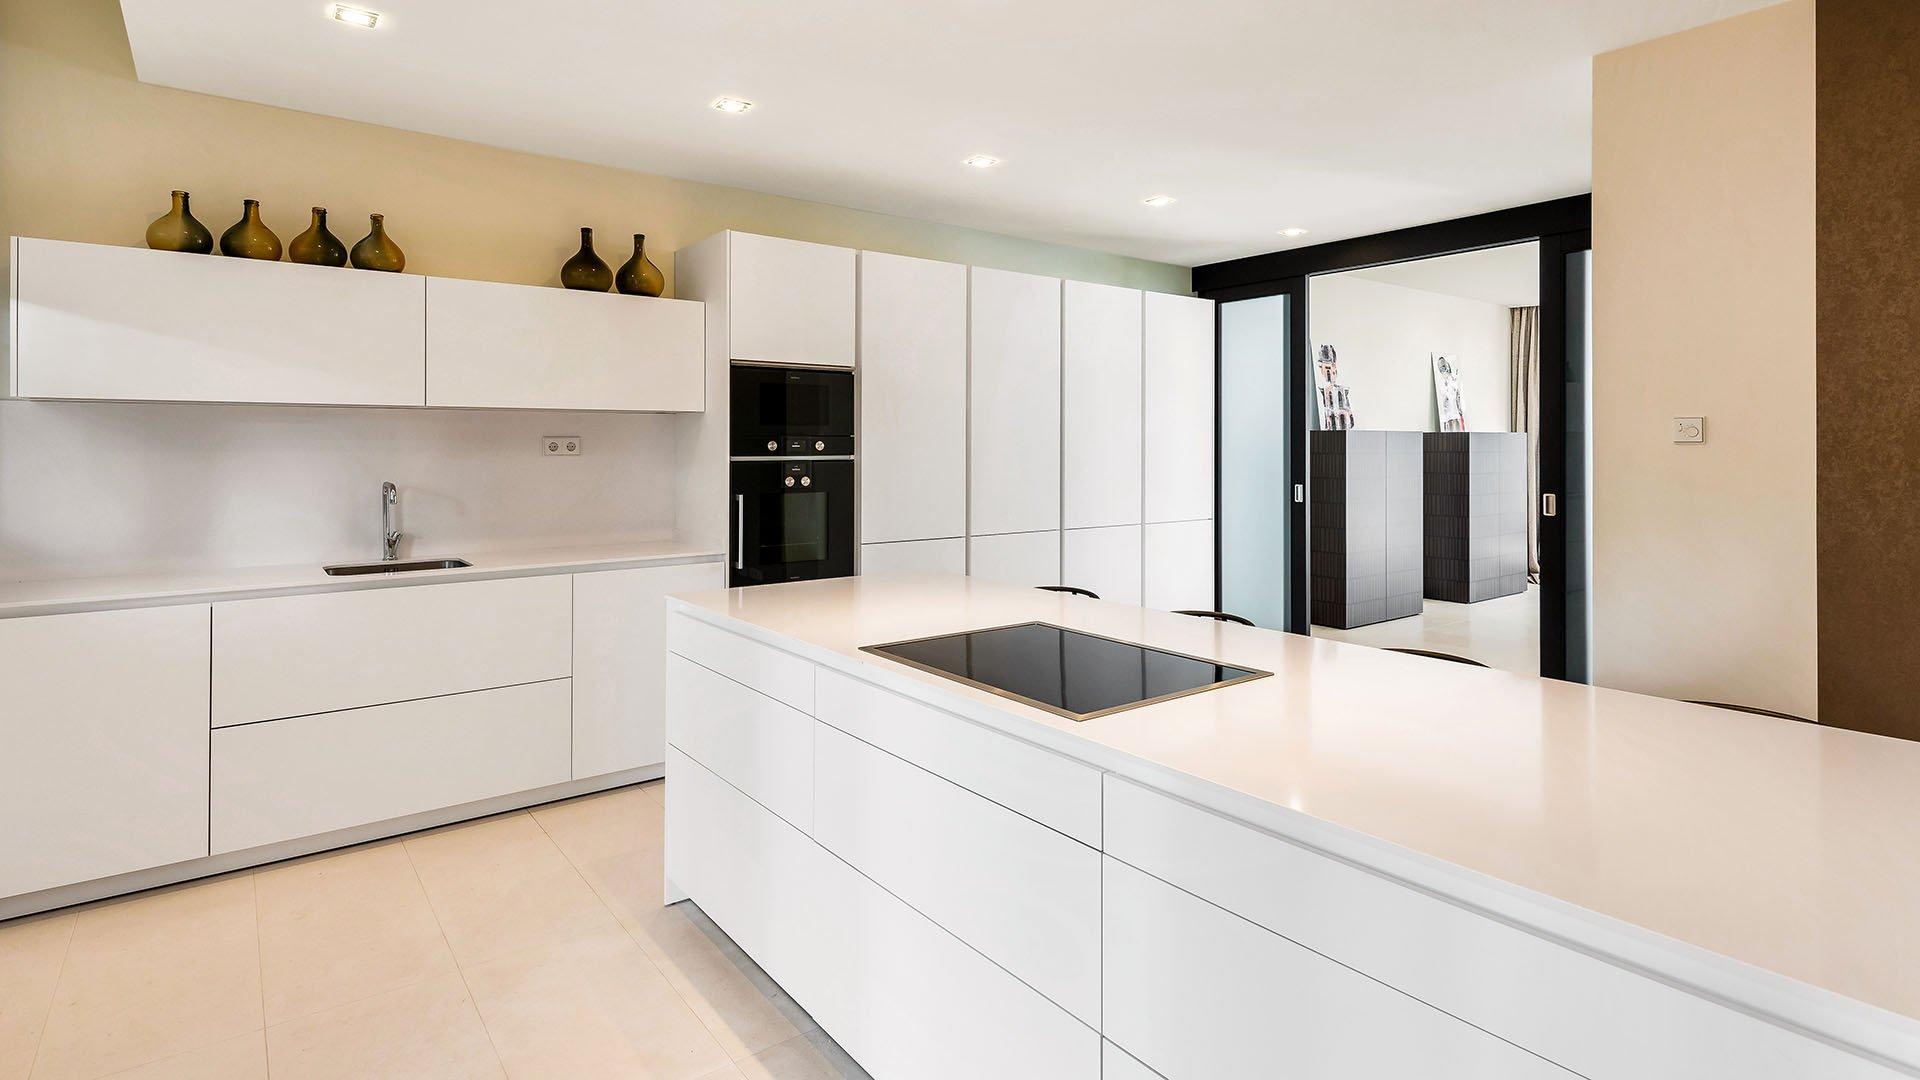 Caprice: Luxury villa in Marbella in an exclusive area